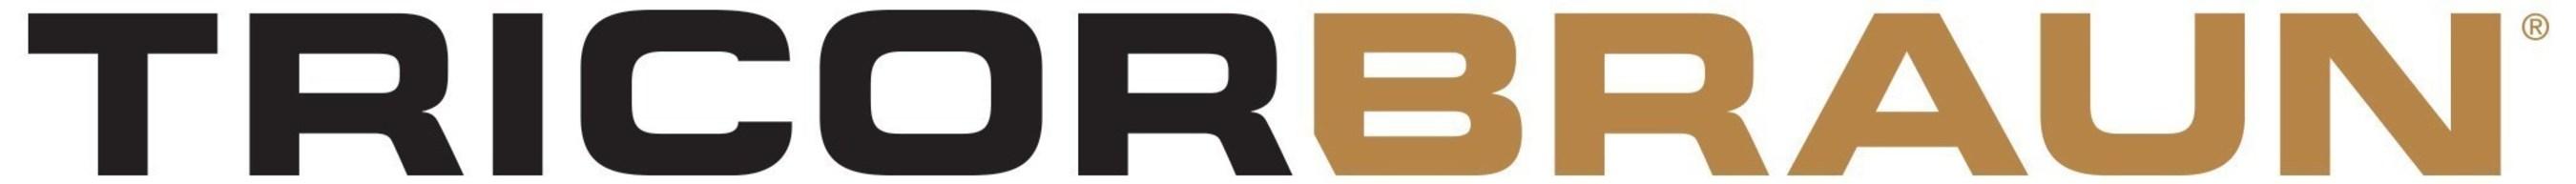 www.tricorbraun.com